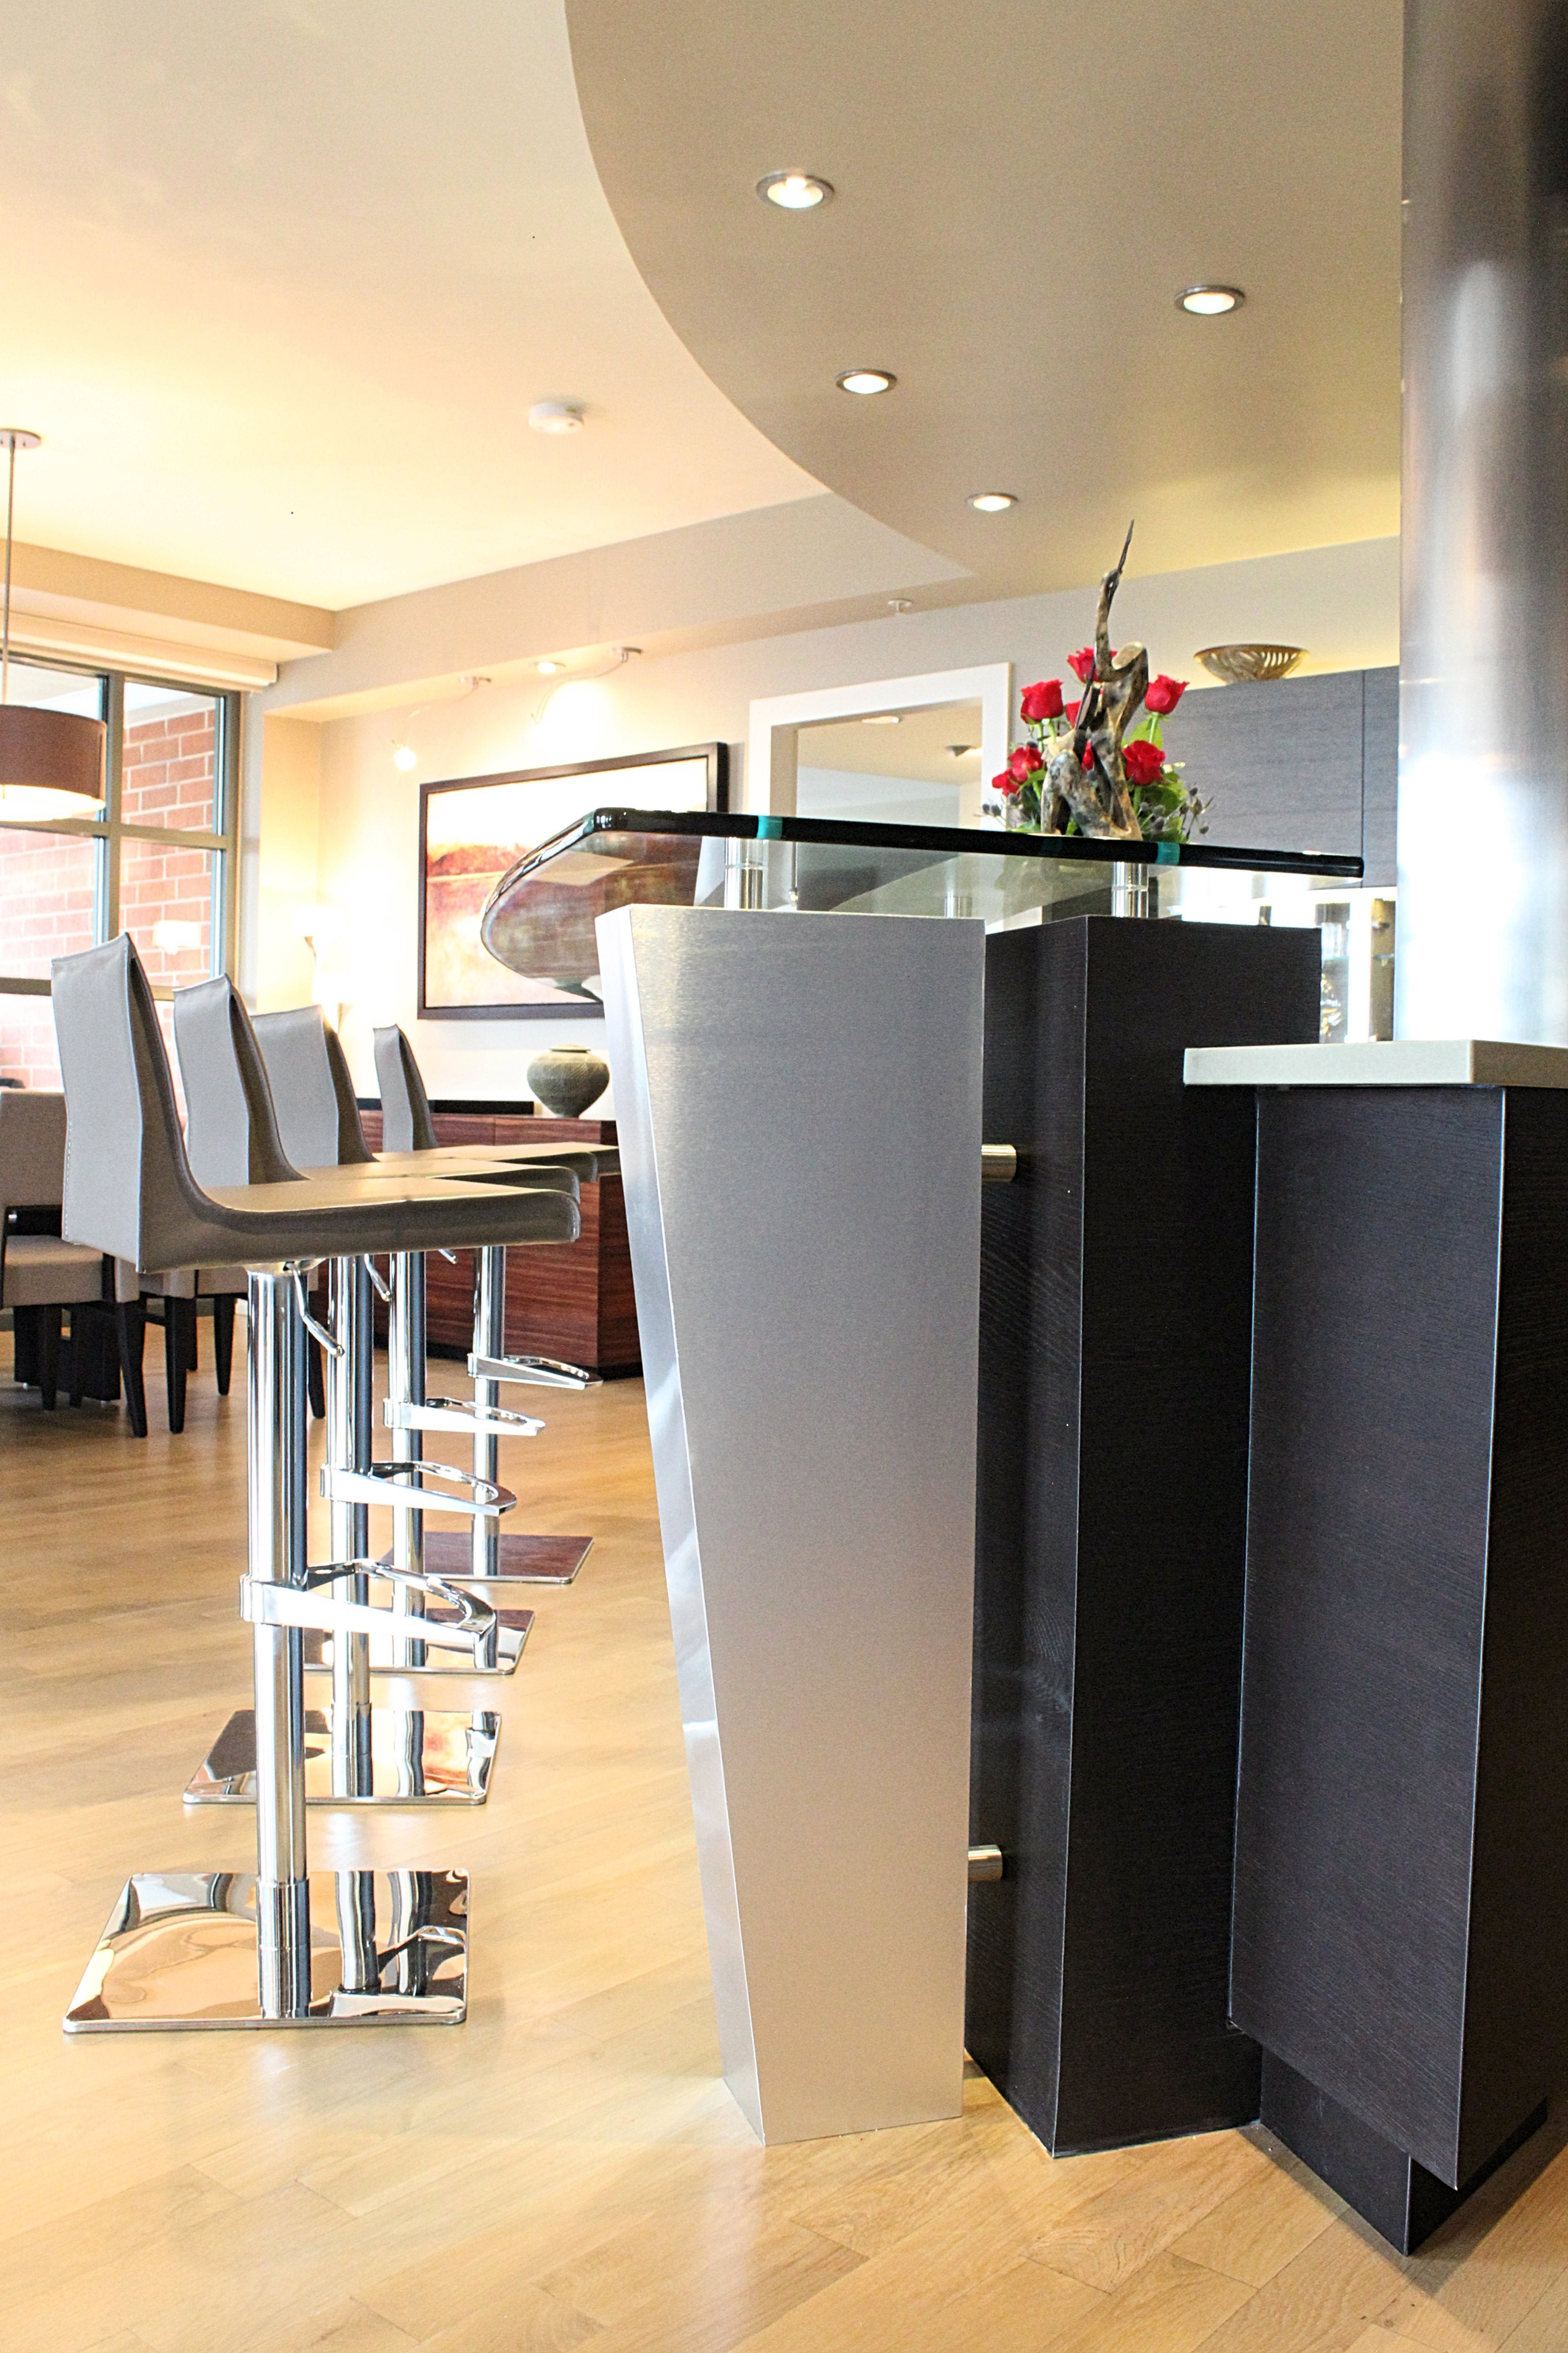 tinys-granite-works-modern-kitchen-1